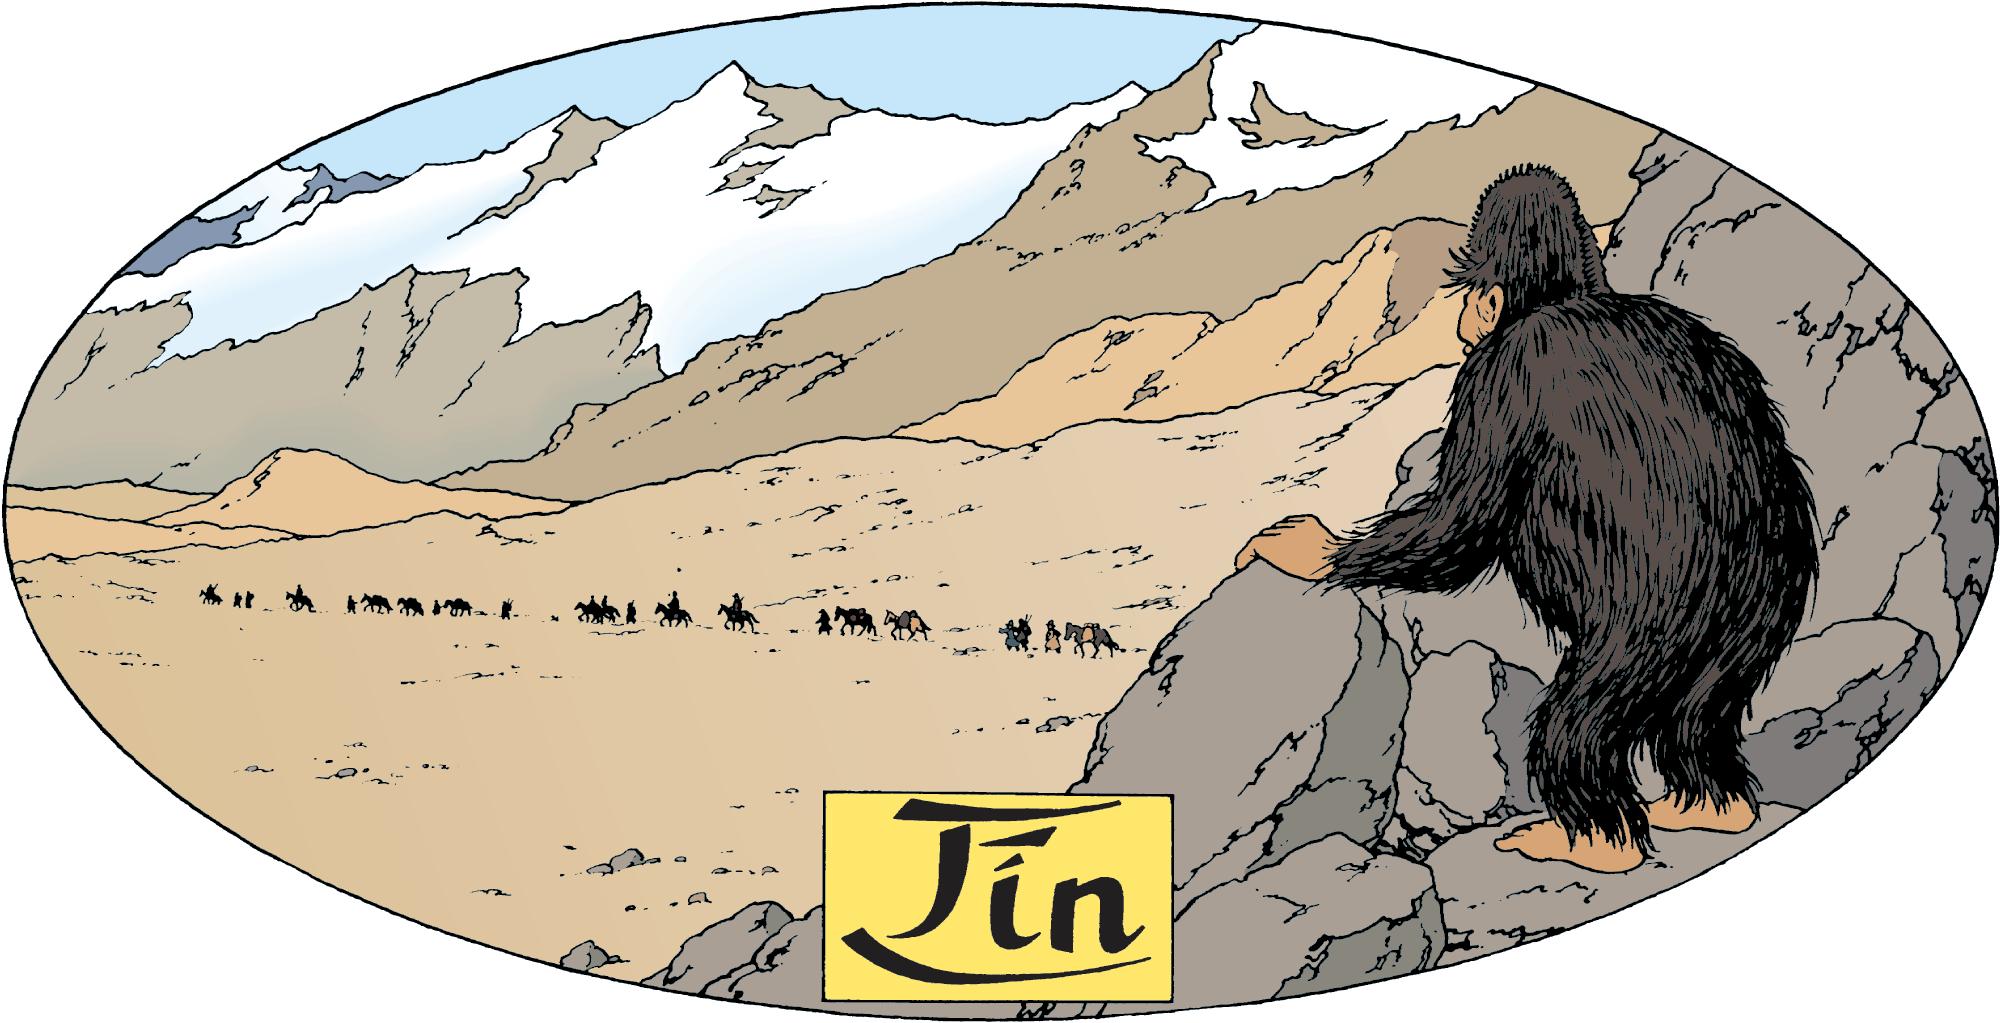 Tintin - Les Aventures de Tintin - Tintin au tibet - L'abominable Homme des Neiges